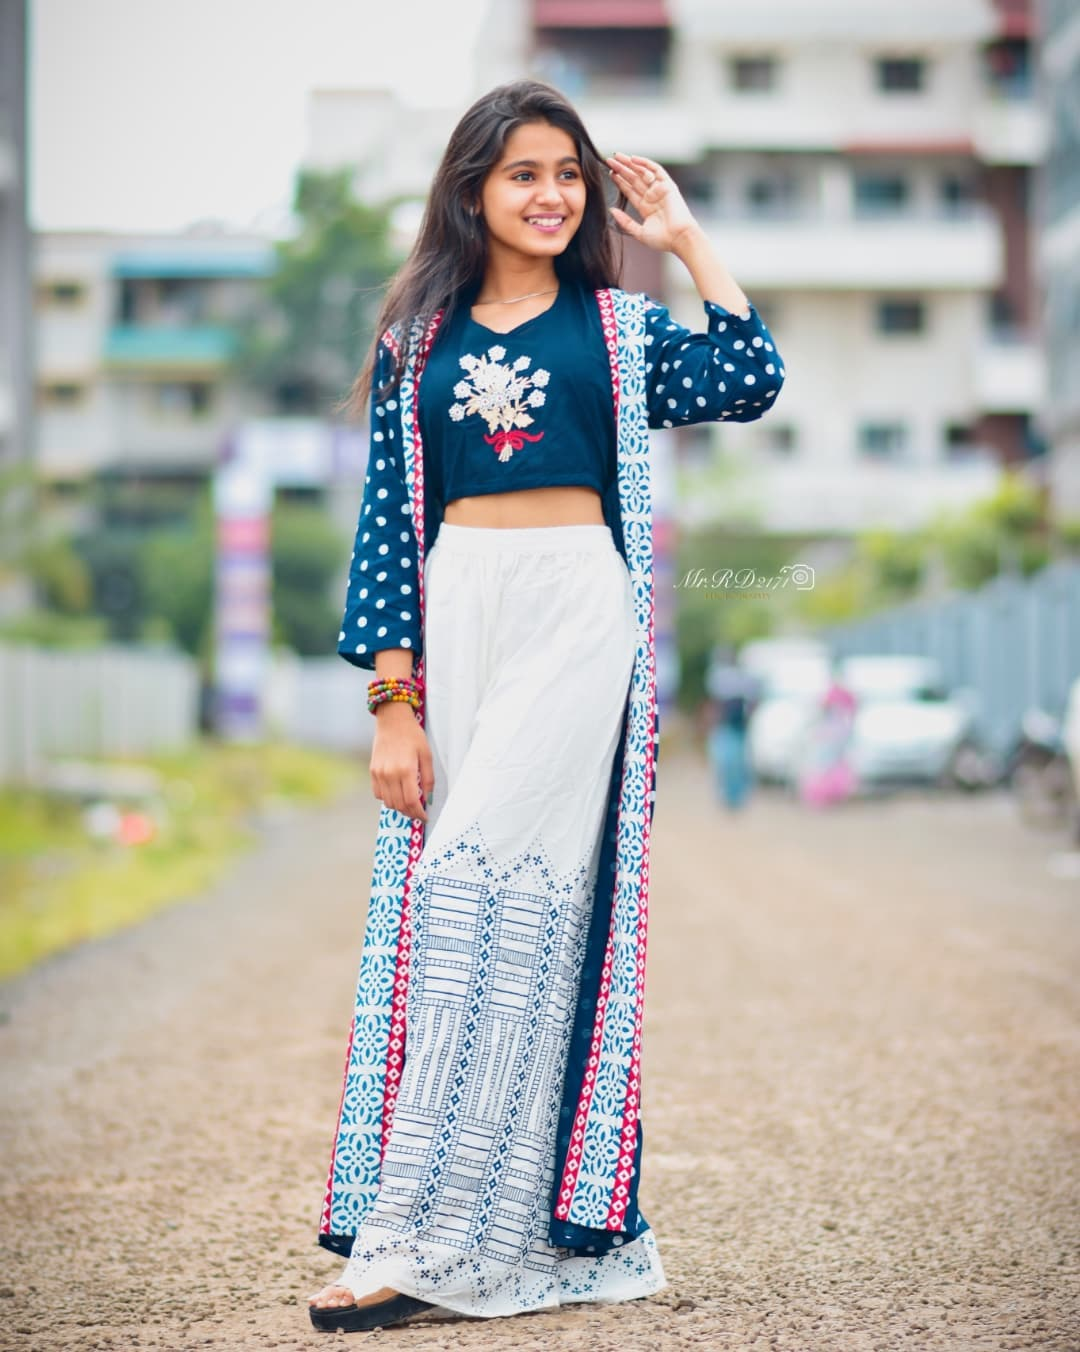 Mahi Singhvi Misty Instagram Photos Images Download